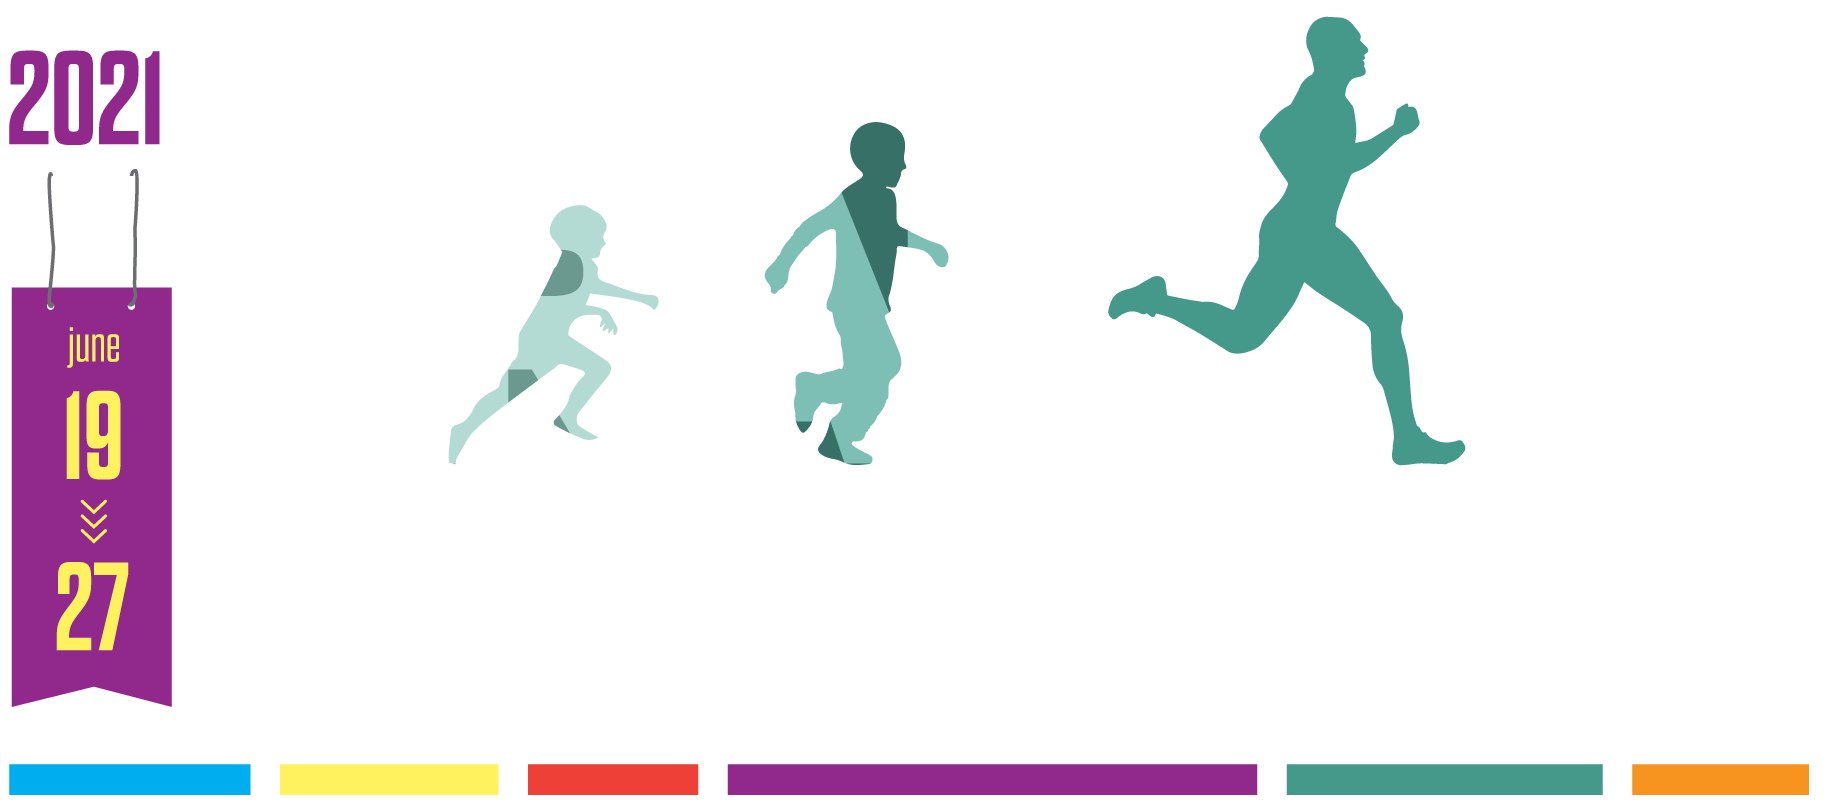 Our inaugural Race Across America for Trauma Awareness logo